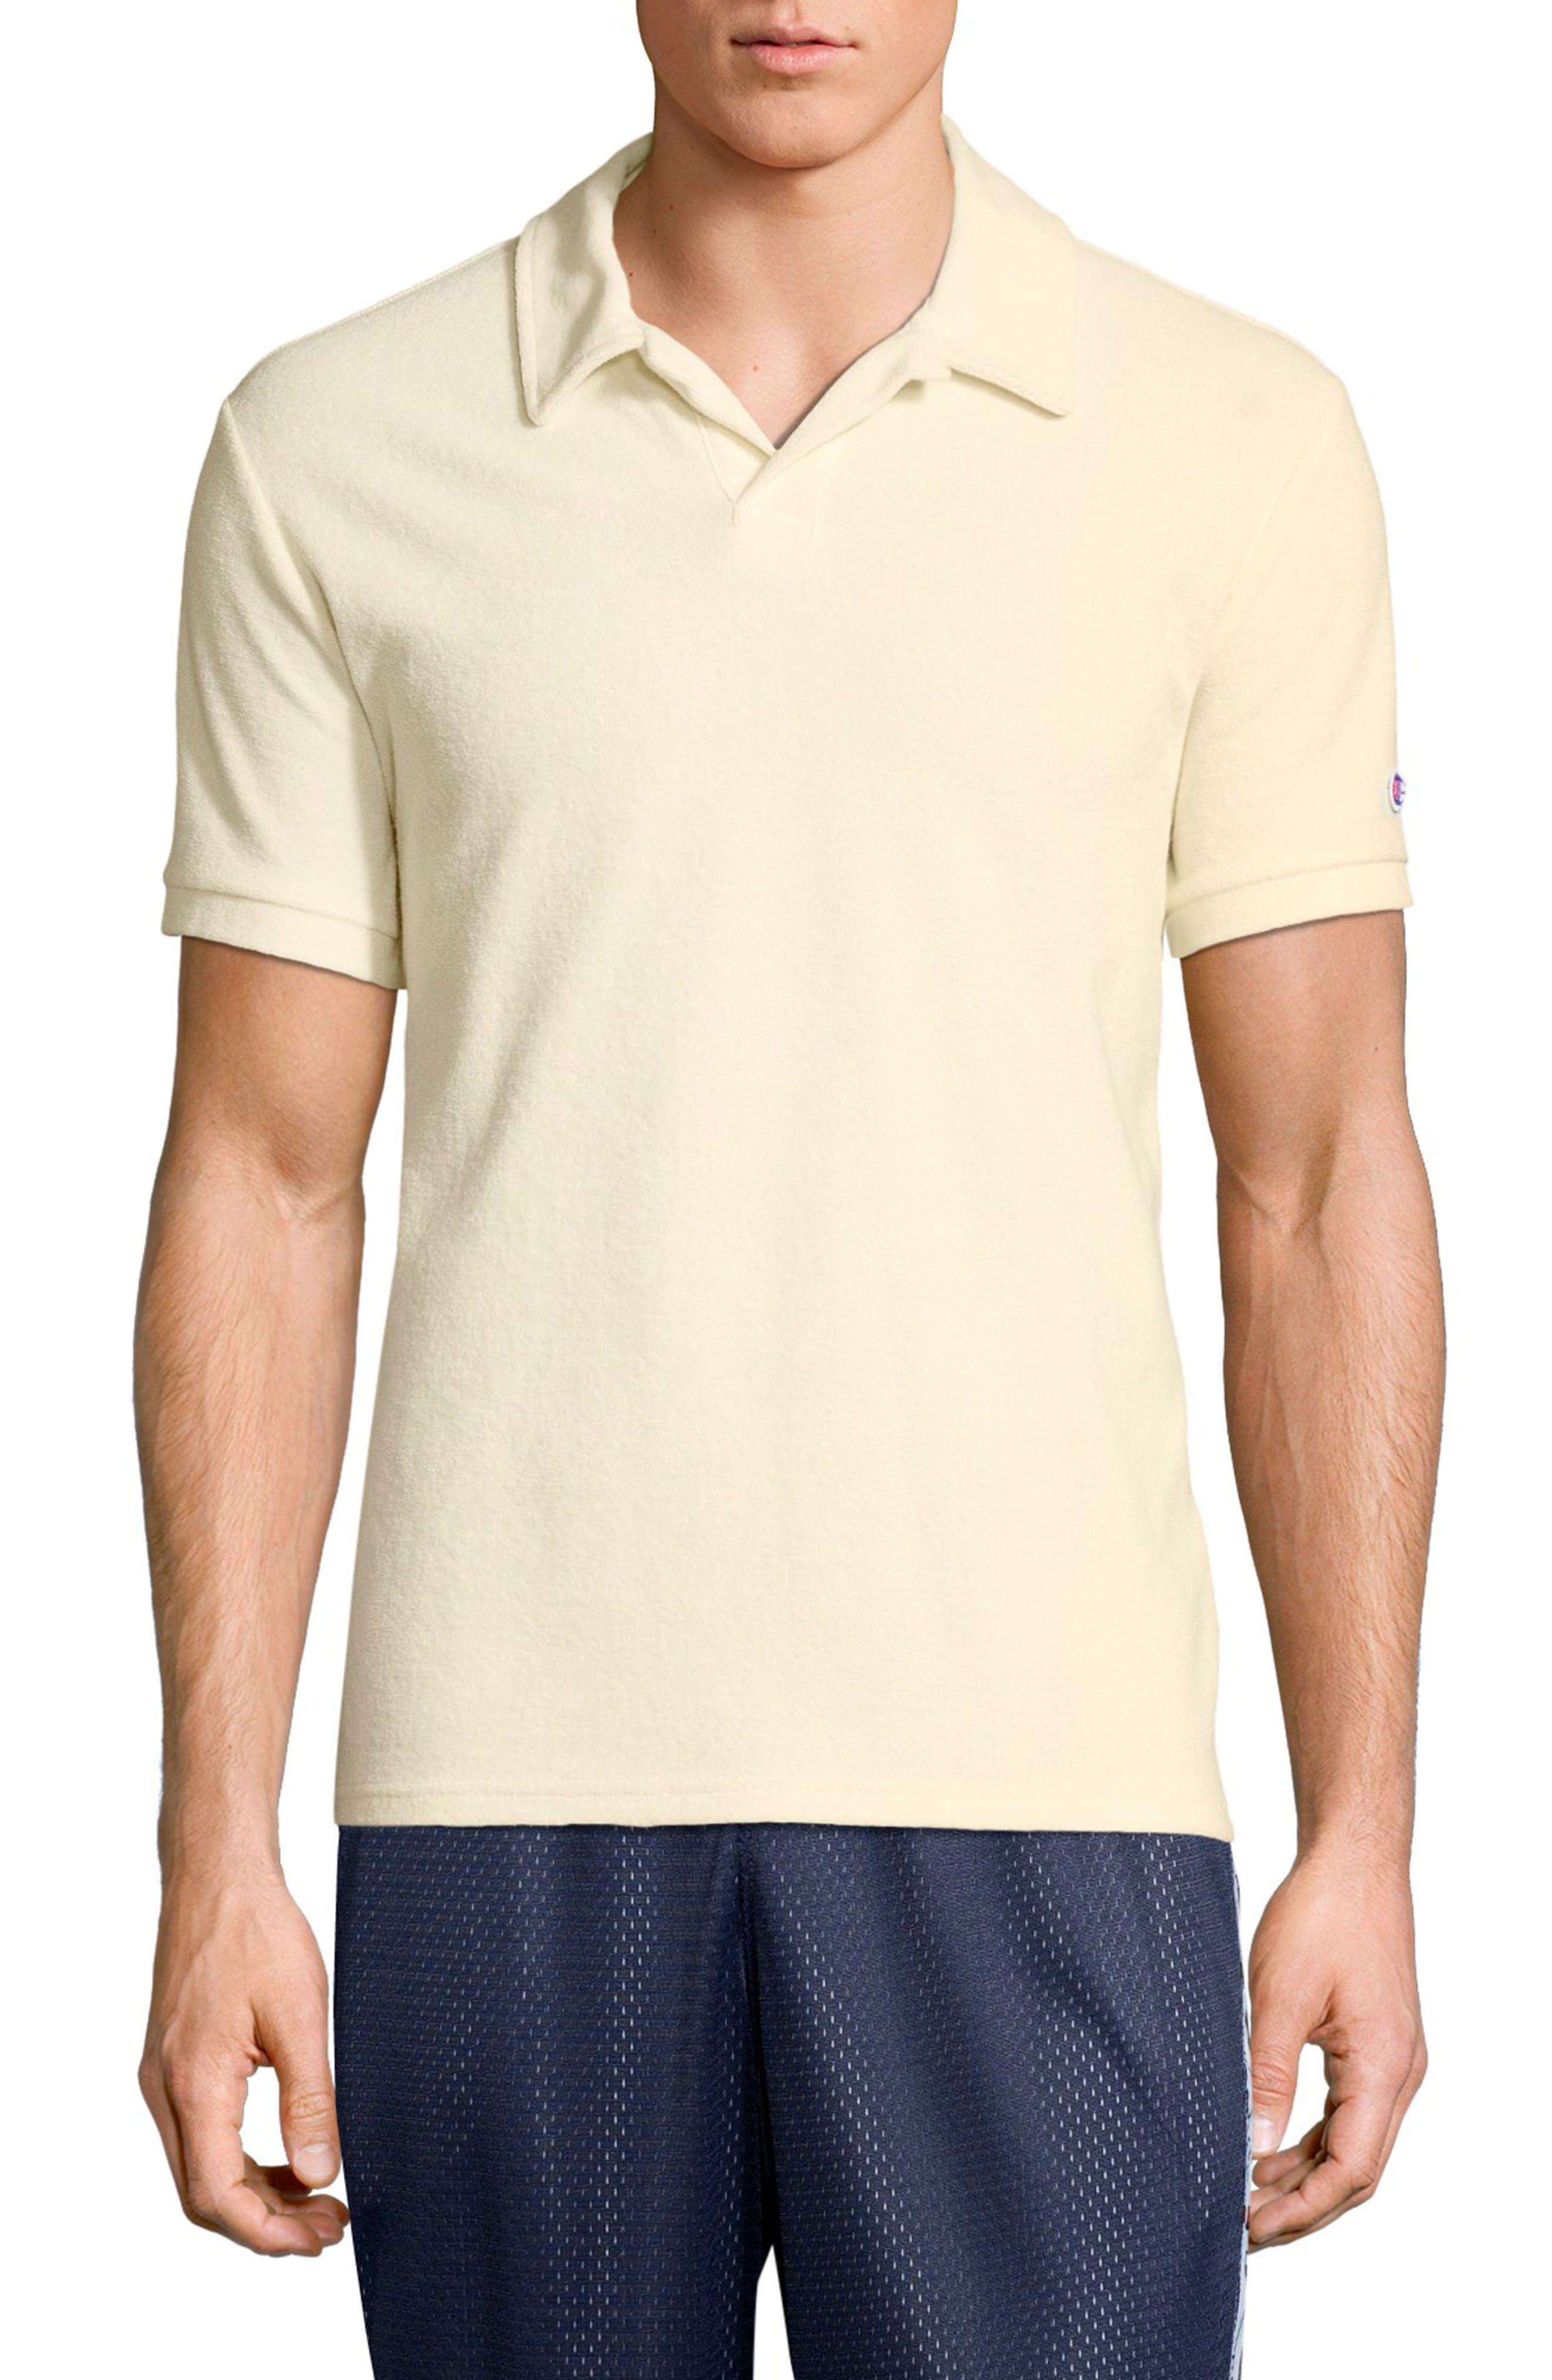 Sponge Terry Crewneck Sweatshirt,                         Main,                         color, WHITE ALABASTER